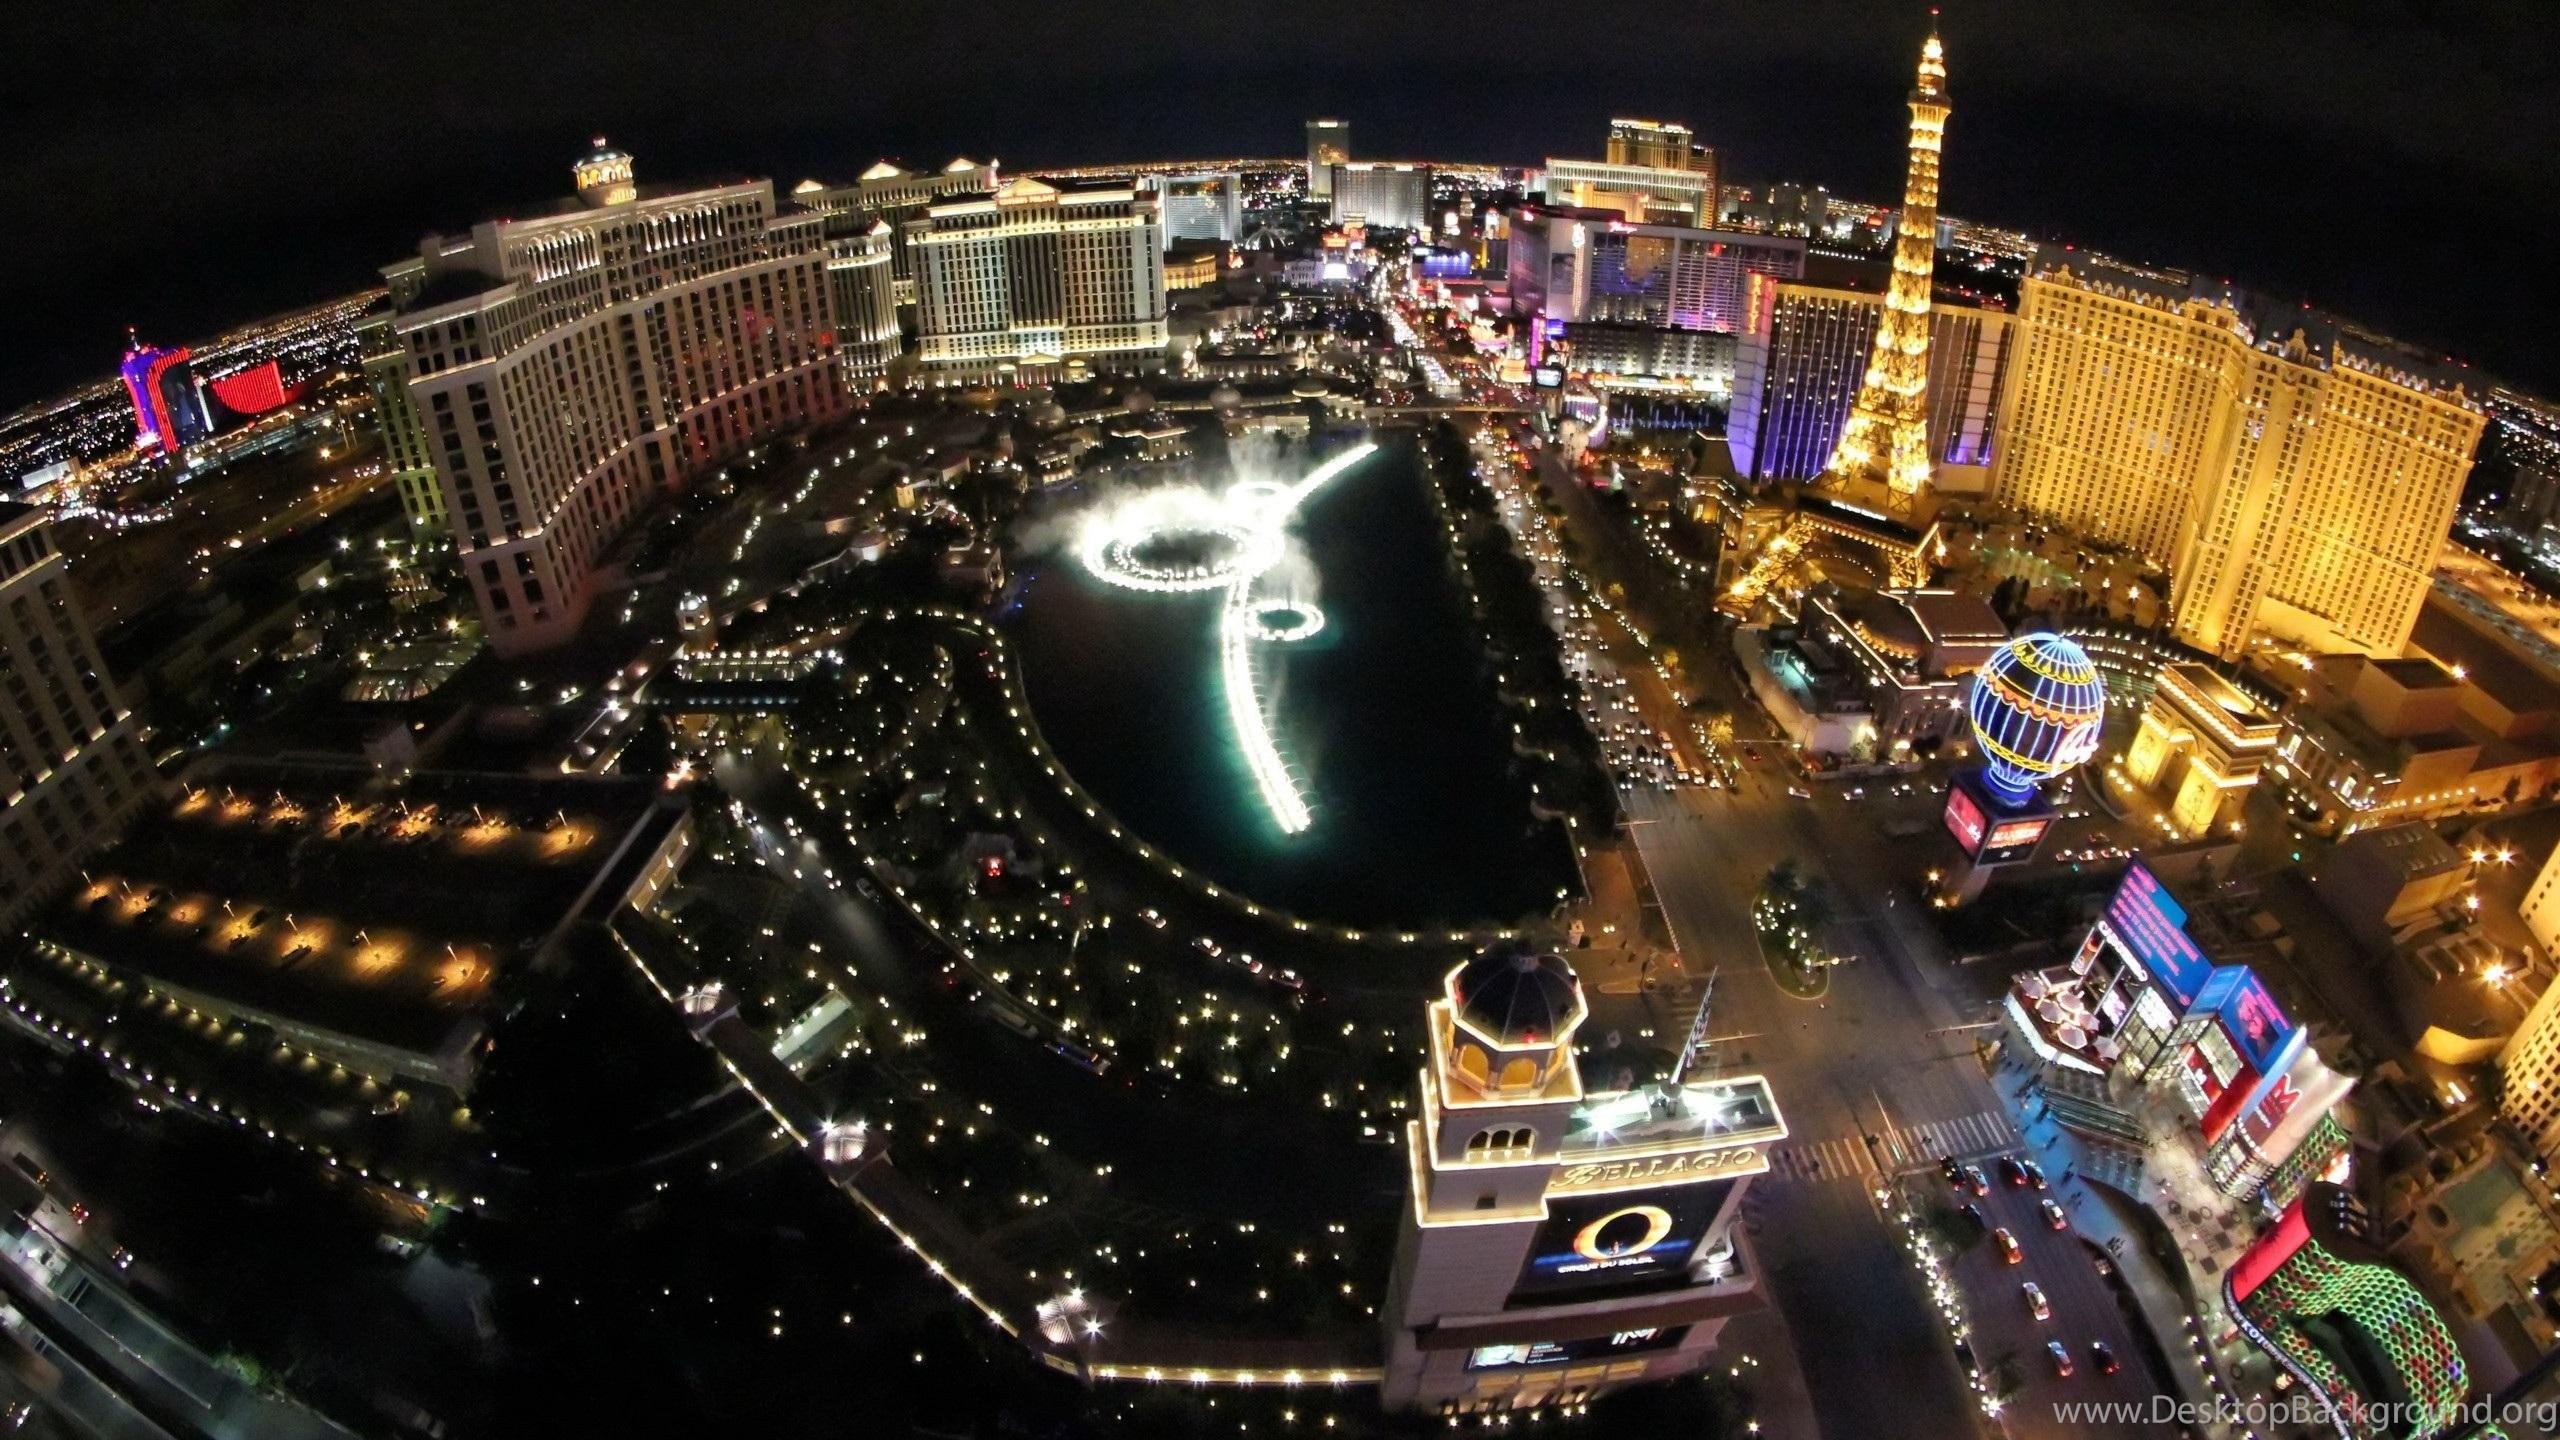 Las Vegas Night Hd Wallpaper Get It Now Desktop Background